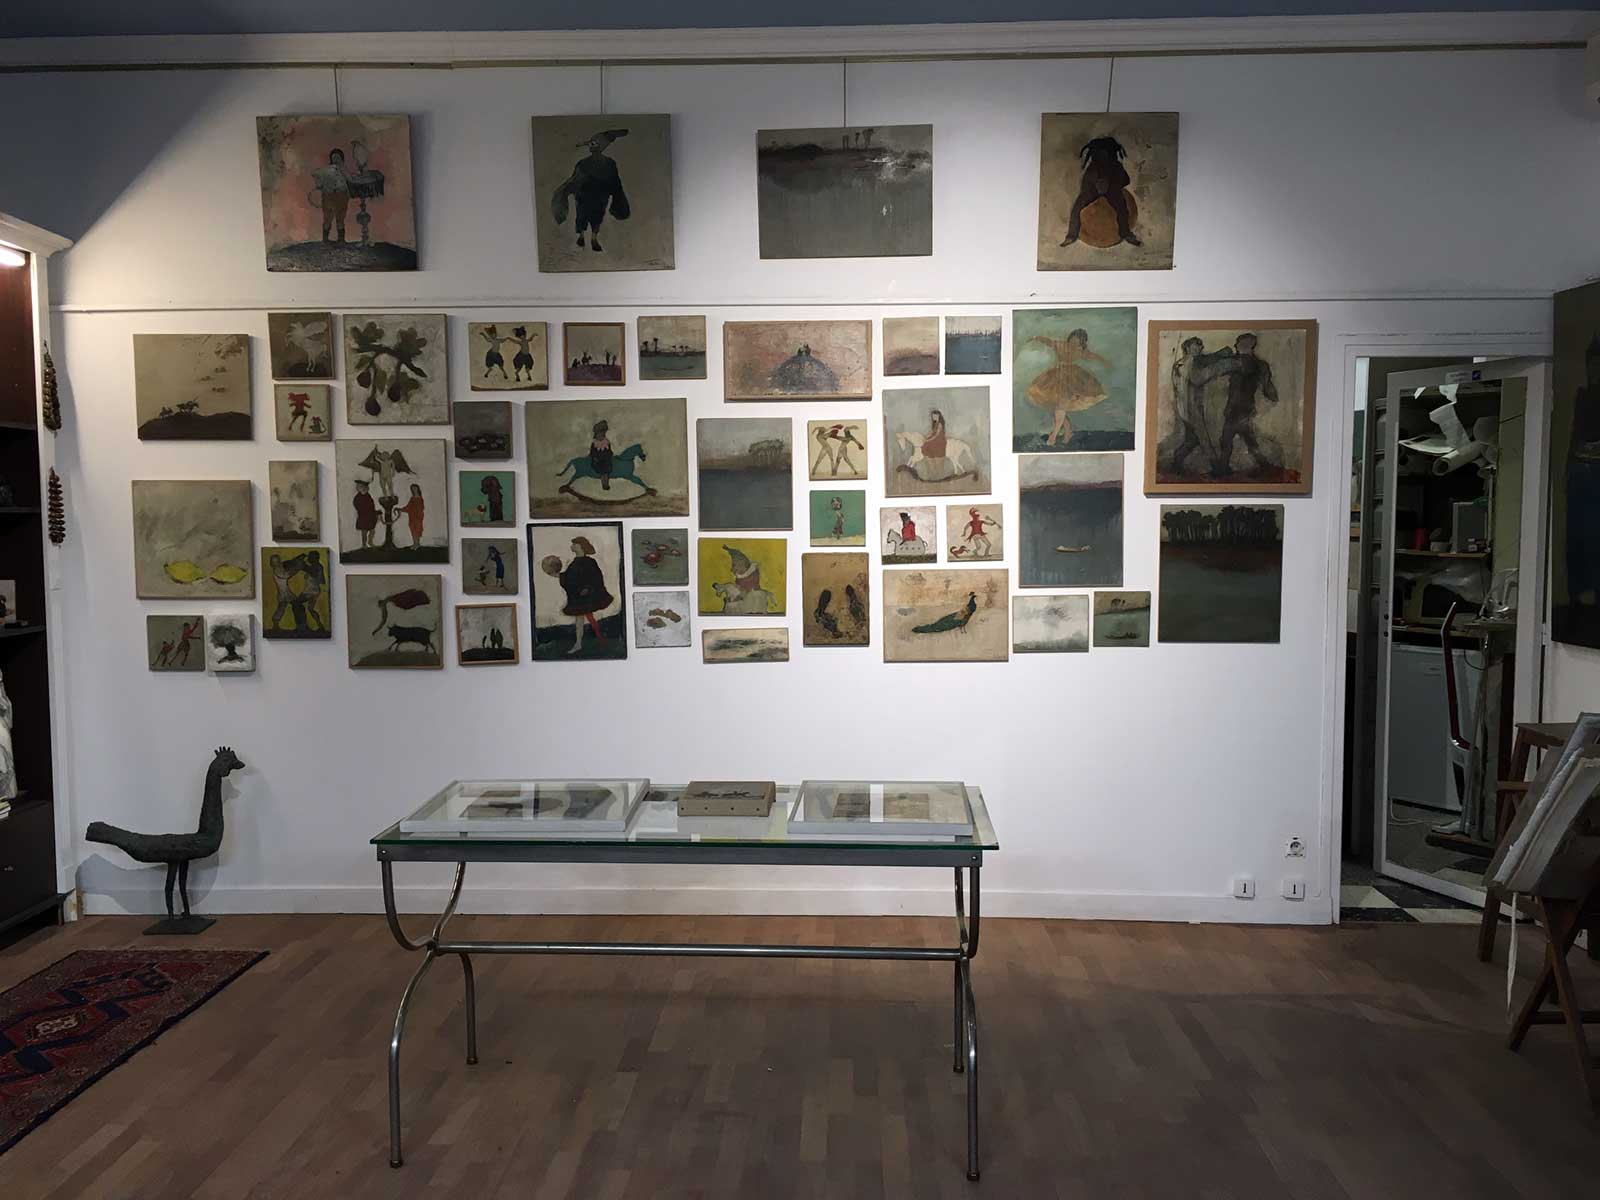 Corinne Tichadou artiste peintre galerie Elyette Peyre artiste peintre Bézier tableaux peinture art contemporain